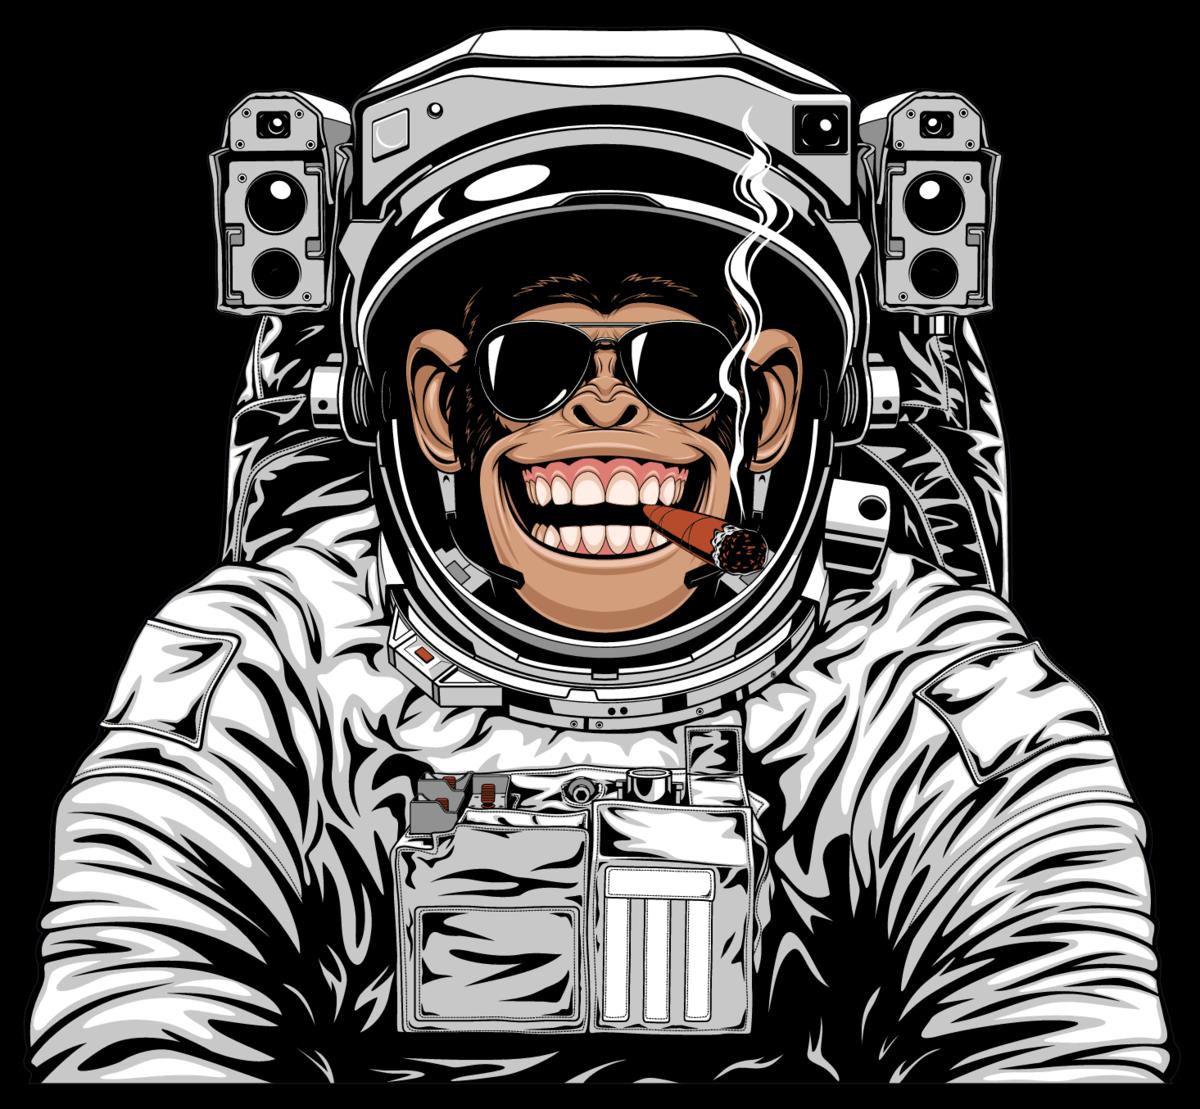 Smoking Chimpanzee Astronaut Sticker